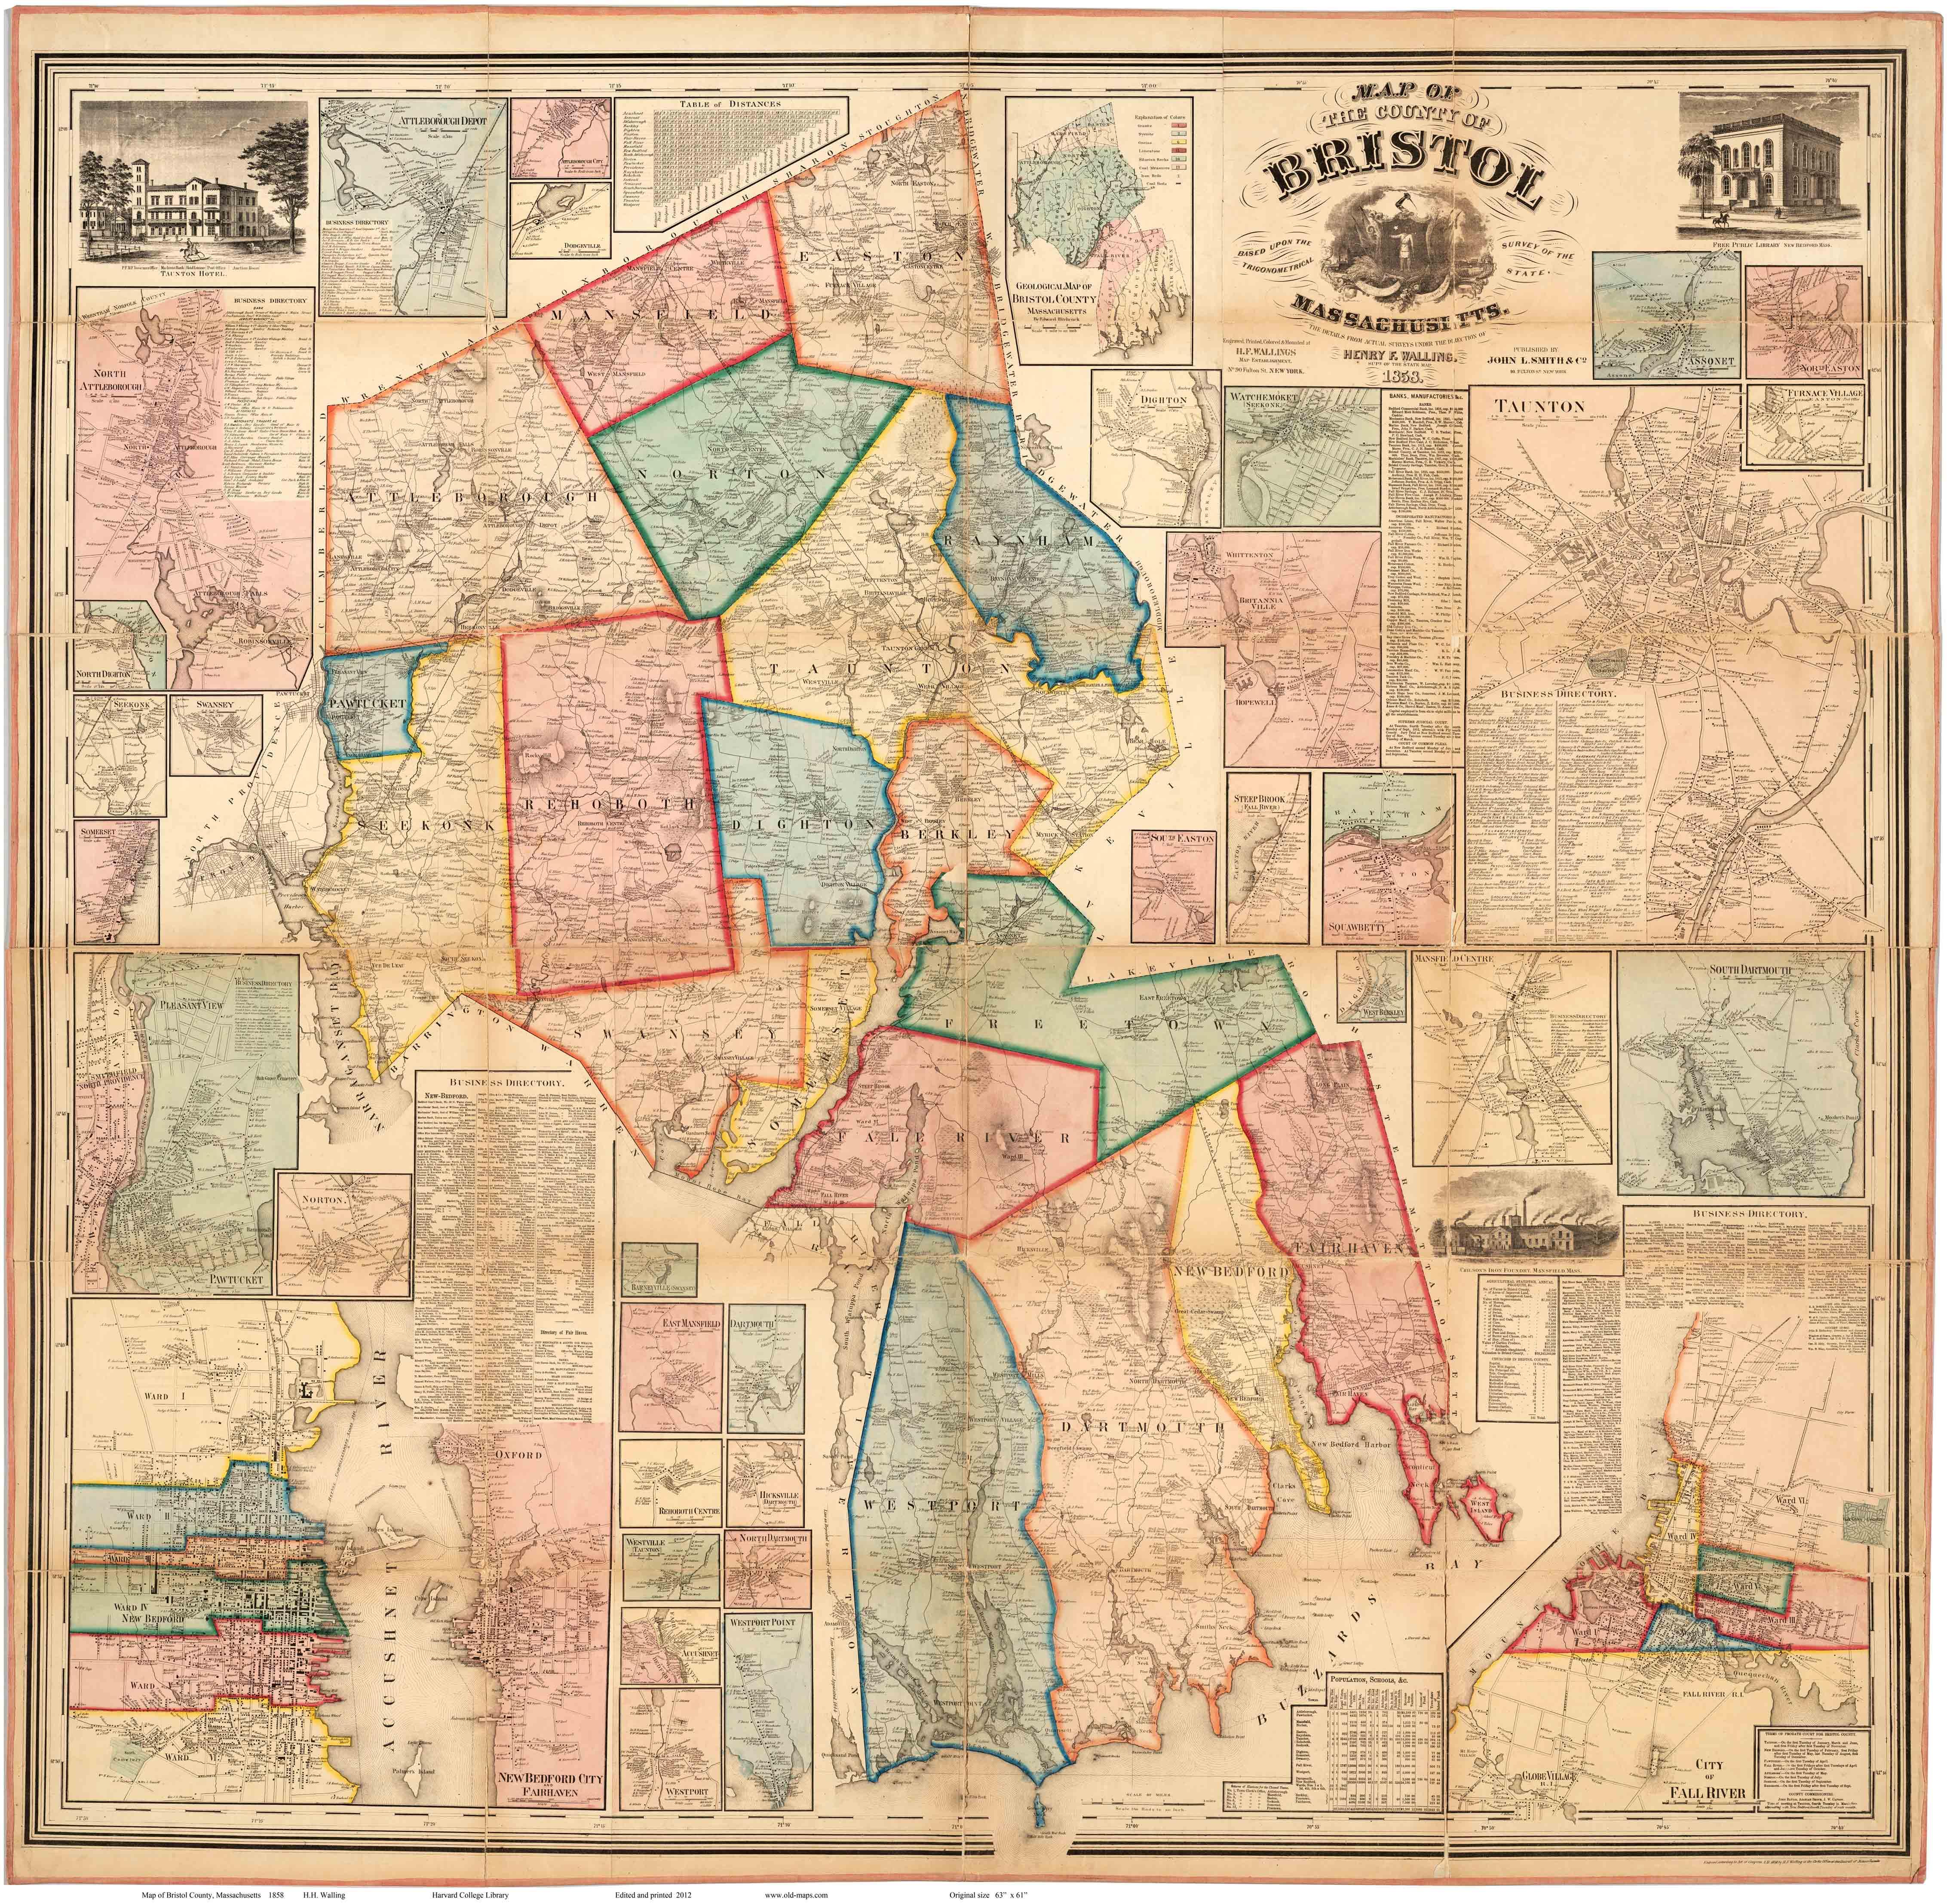 1858 Bristol County Wall Map